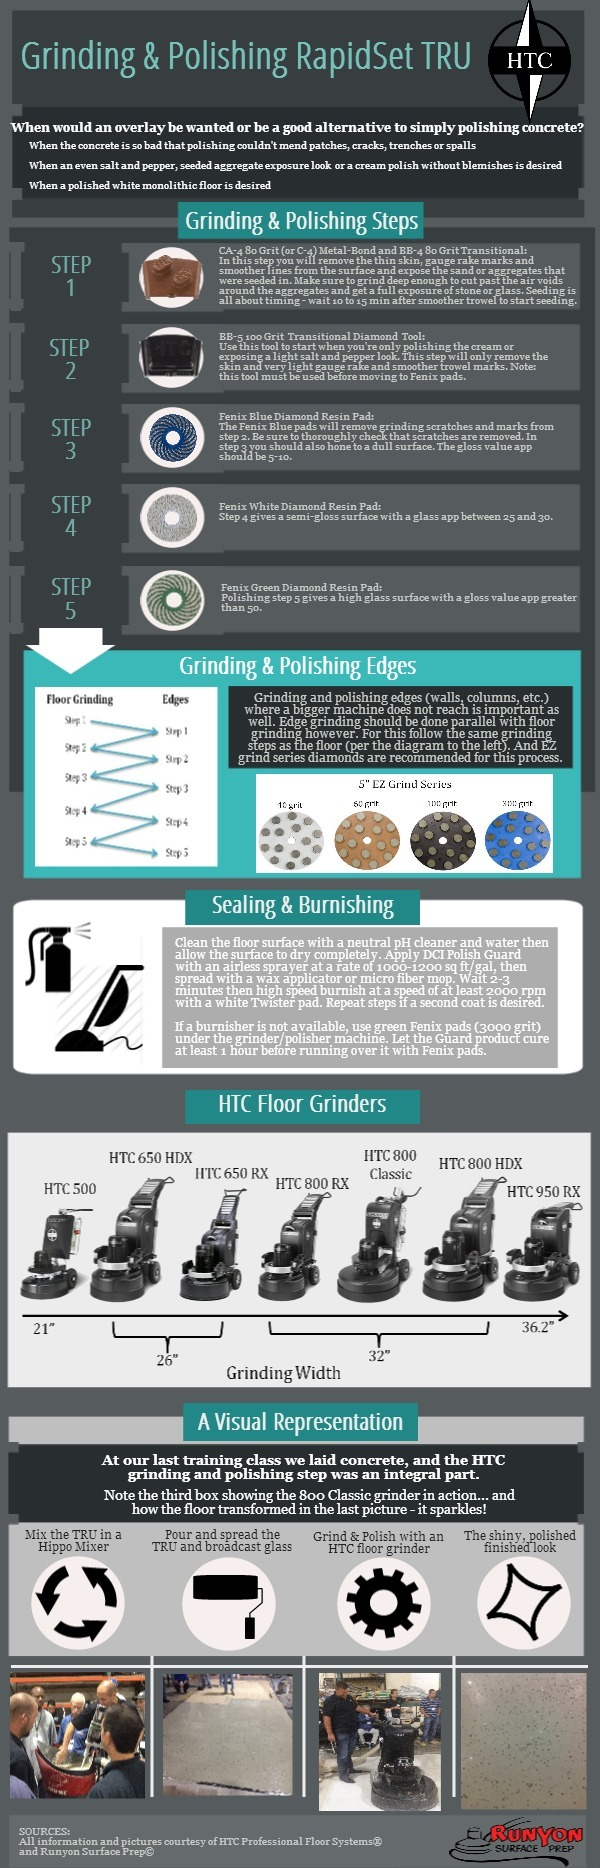 HTC Grinding & Polishing TRU